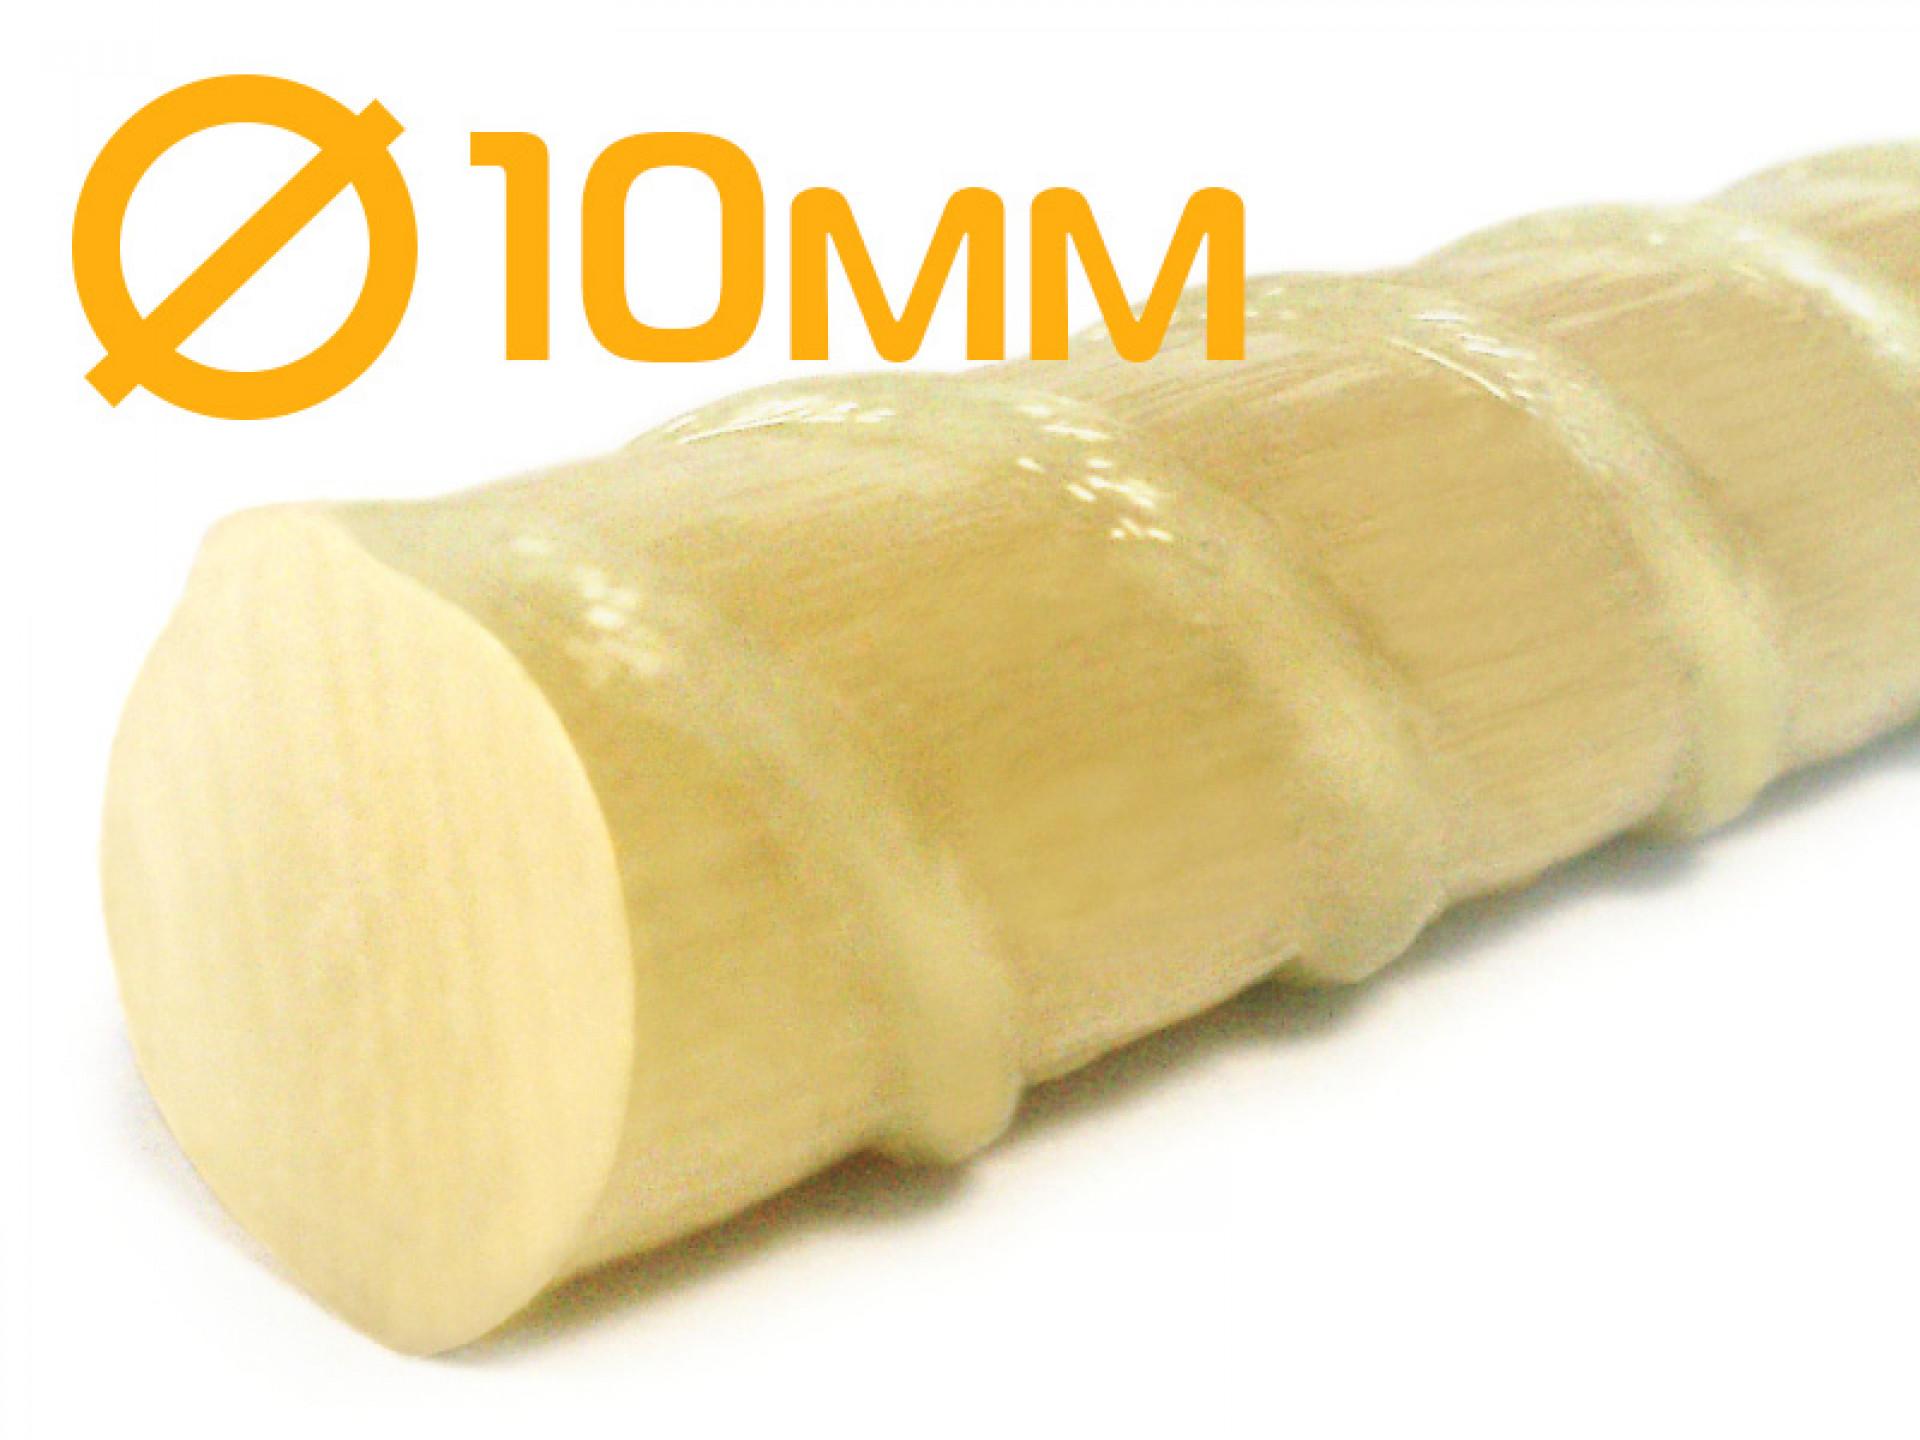 Композитная арматура ТУ 10 миллиметров от производителя в Самаре